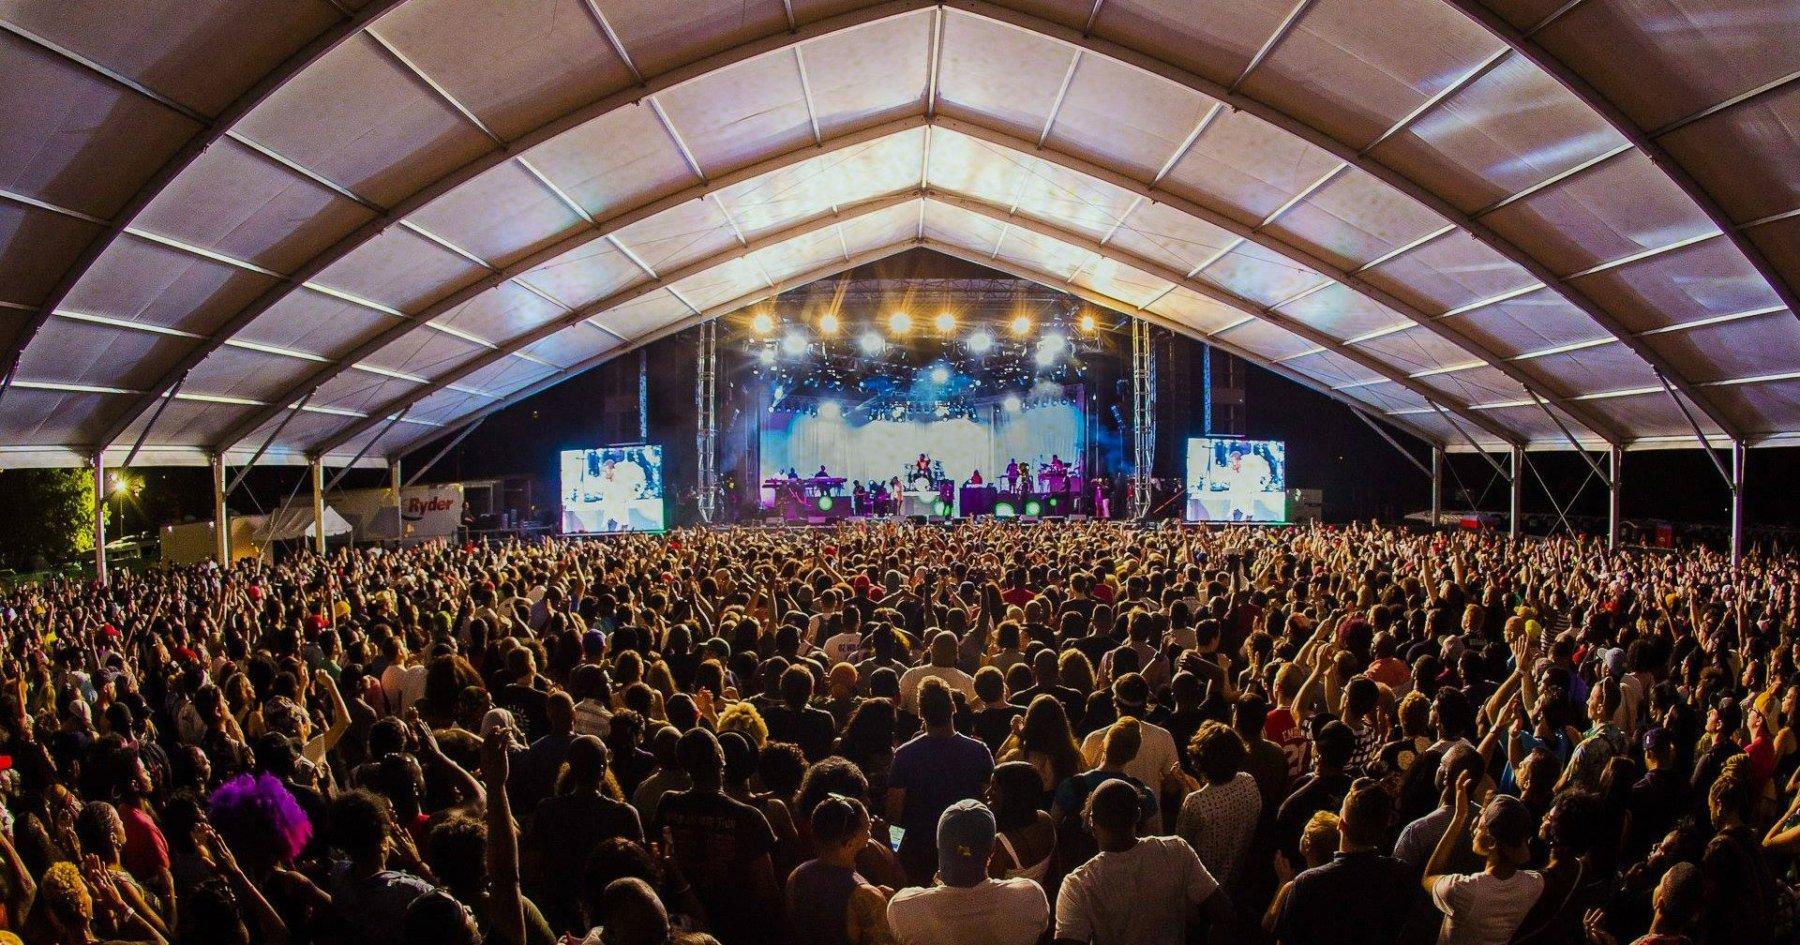 15 Under-the-Radar Music Festivals Worth Considering